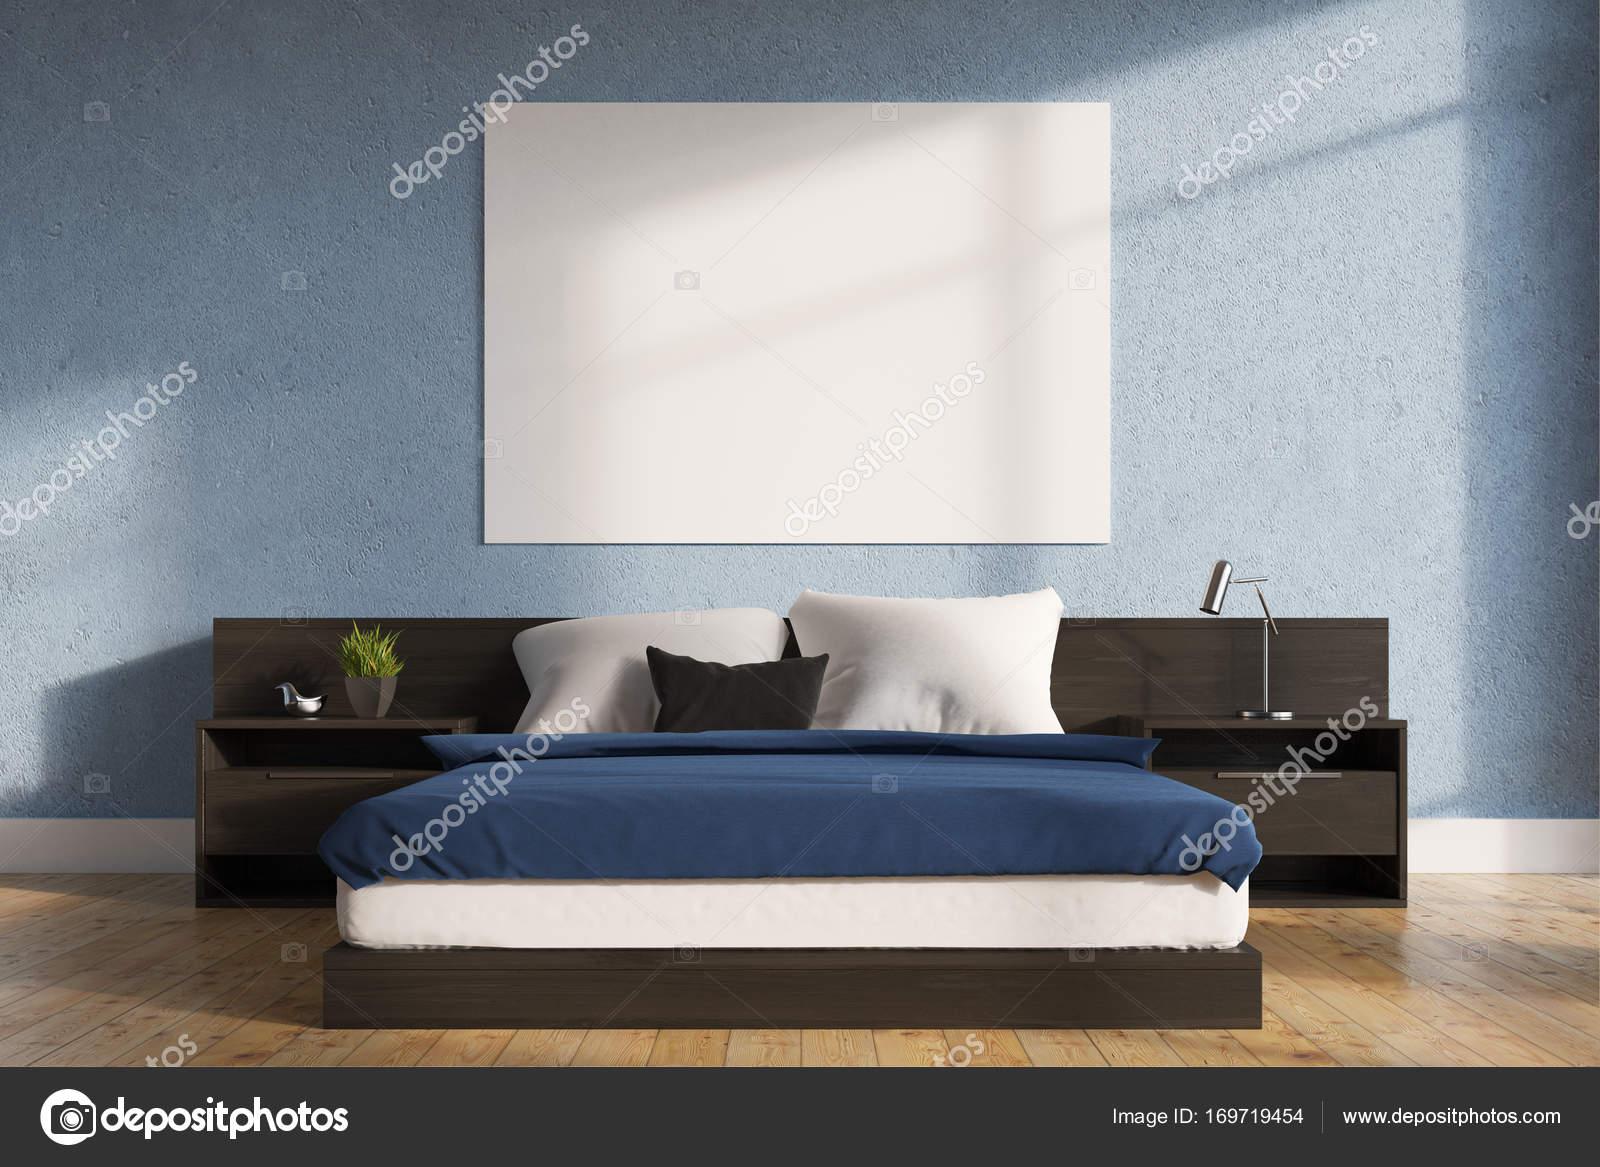 blauwe slaapkamer interieur poster stockfoto